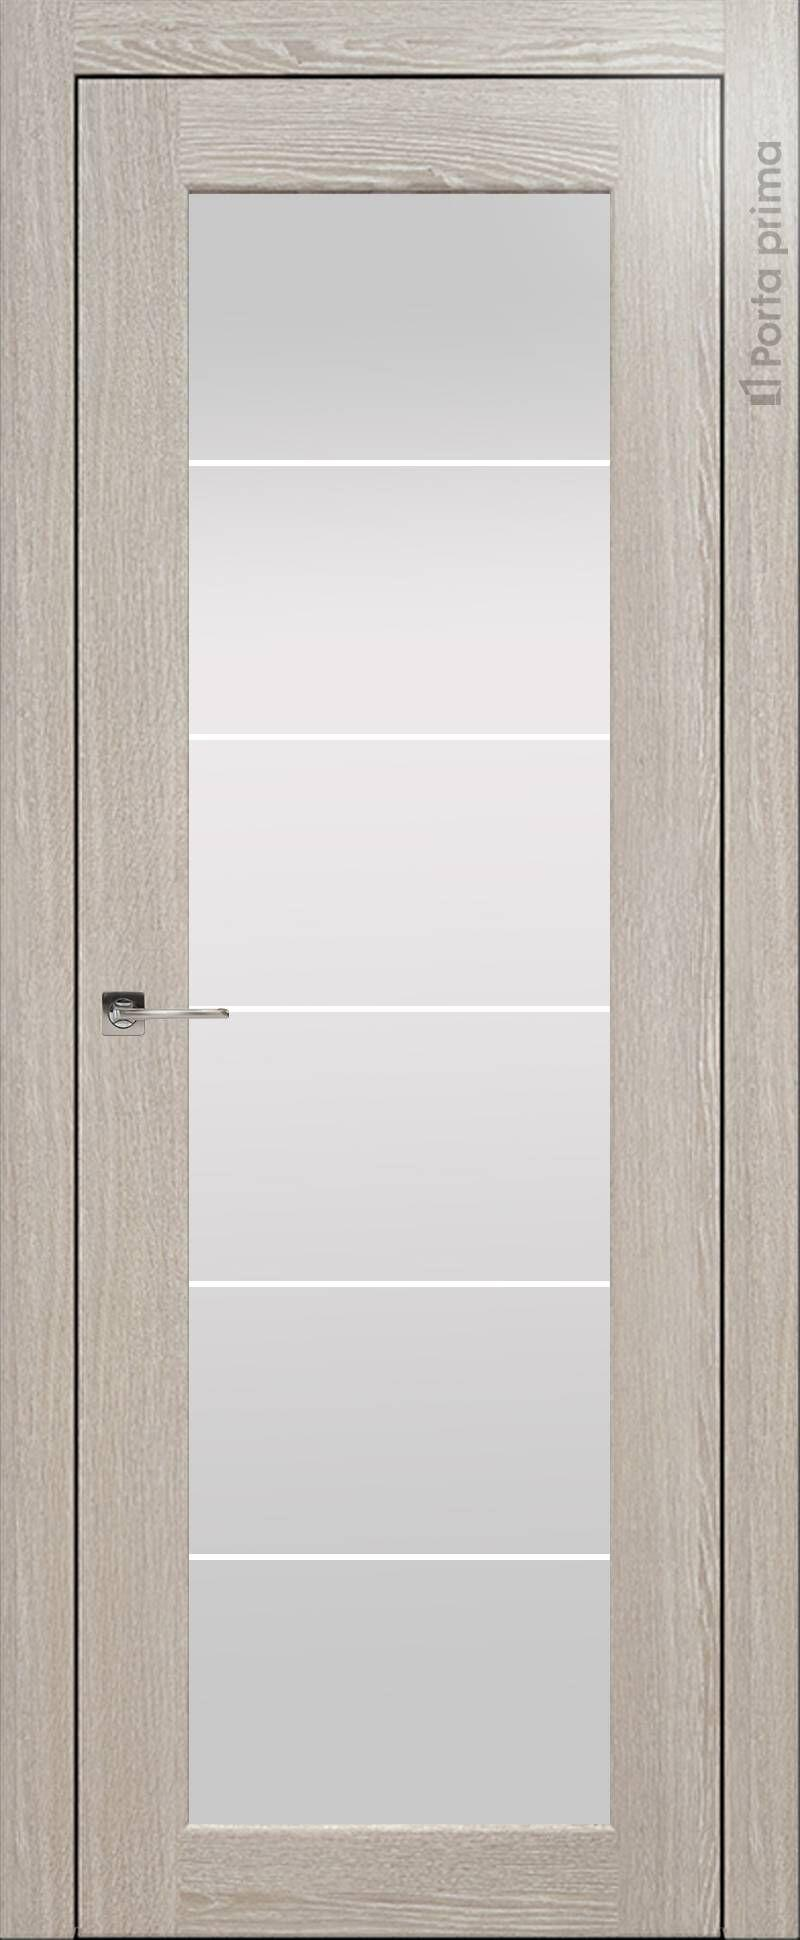 Sonata цвет - Серый дуб Со стеклом (ДО)